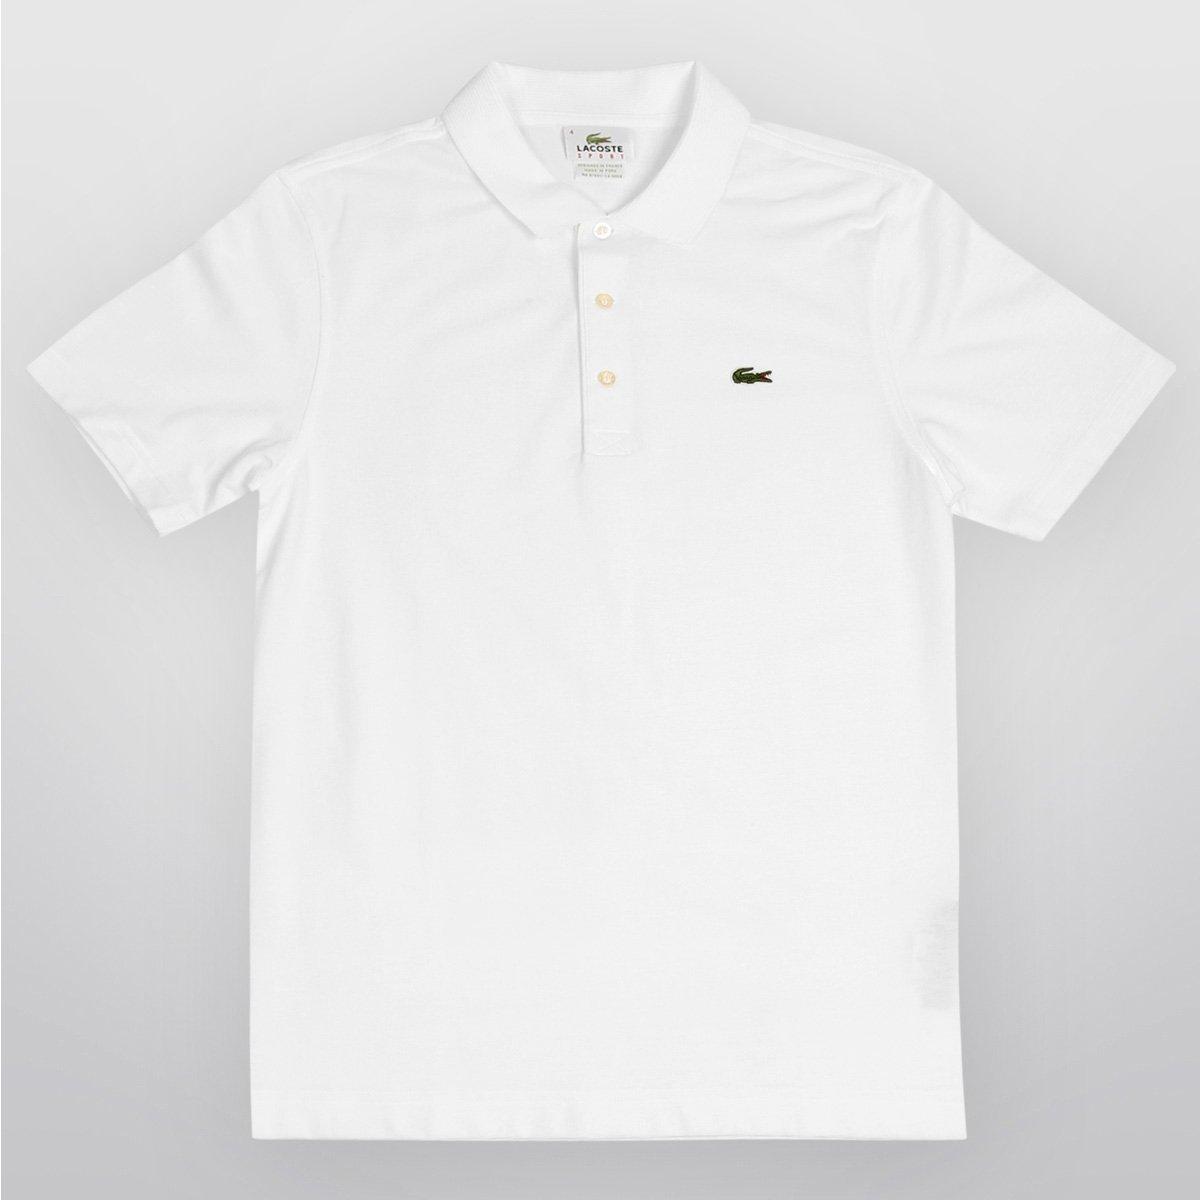 bbcd6c9d80960 Camisa Polo Lacoste Super Light Masculina - Branco - Compre Agora ...